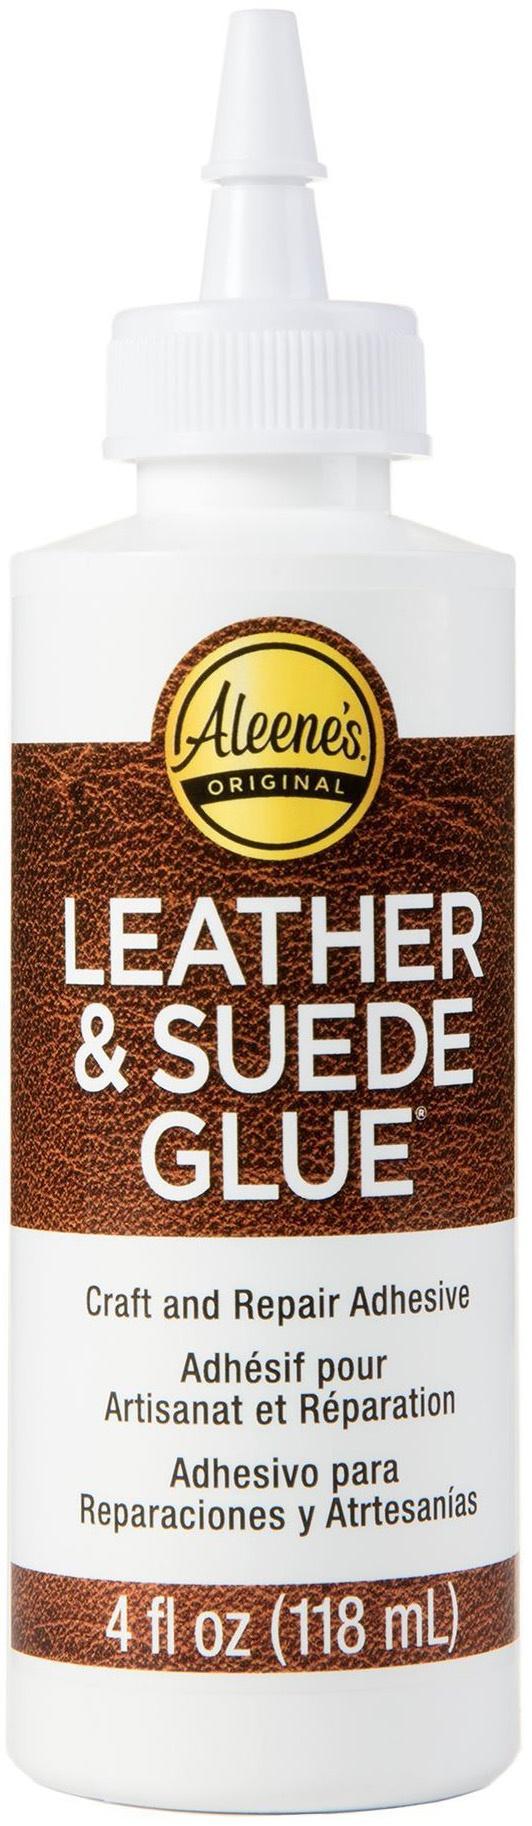 Aleene's Leather & Suede Glue-4oz